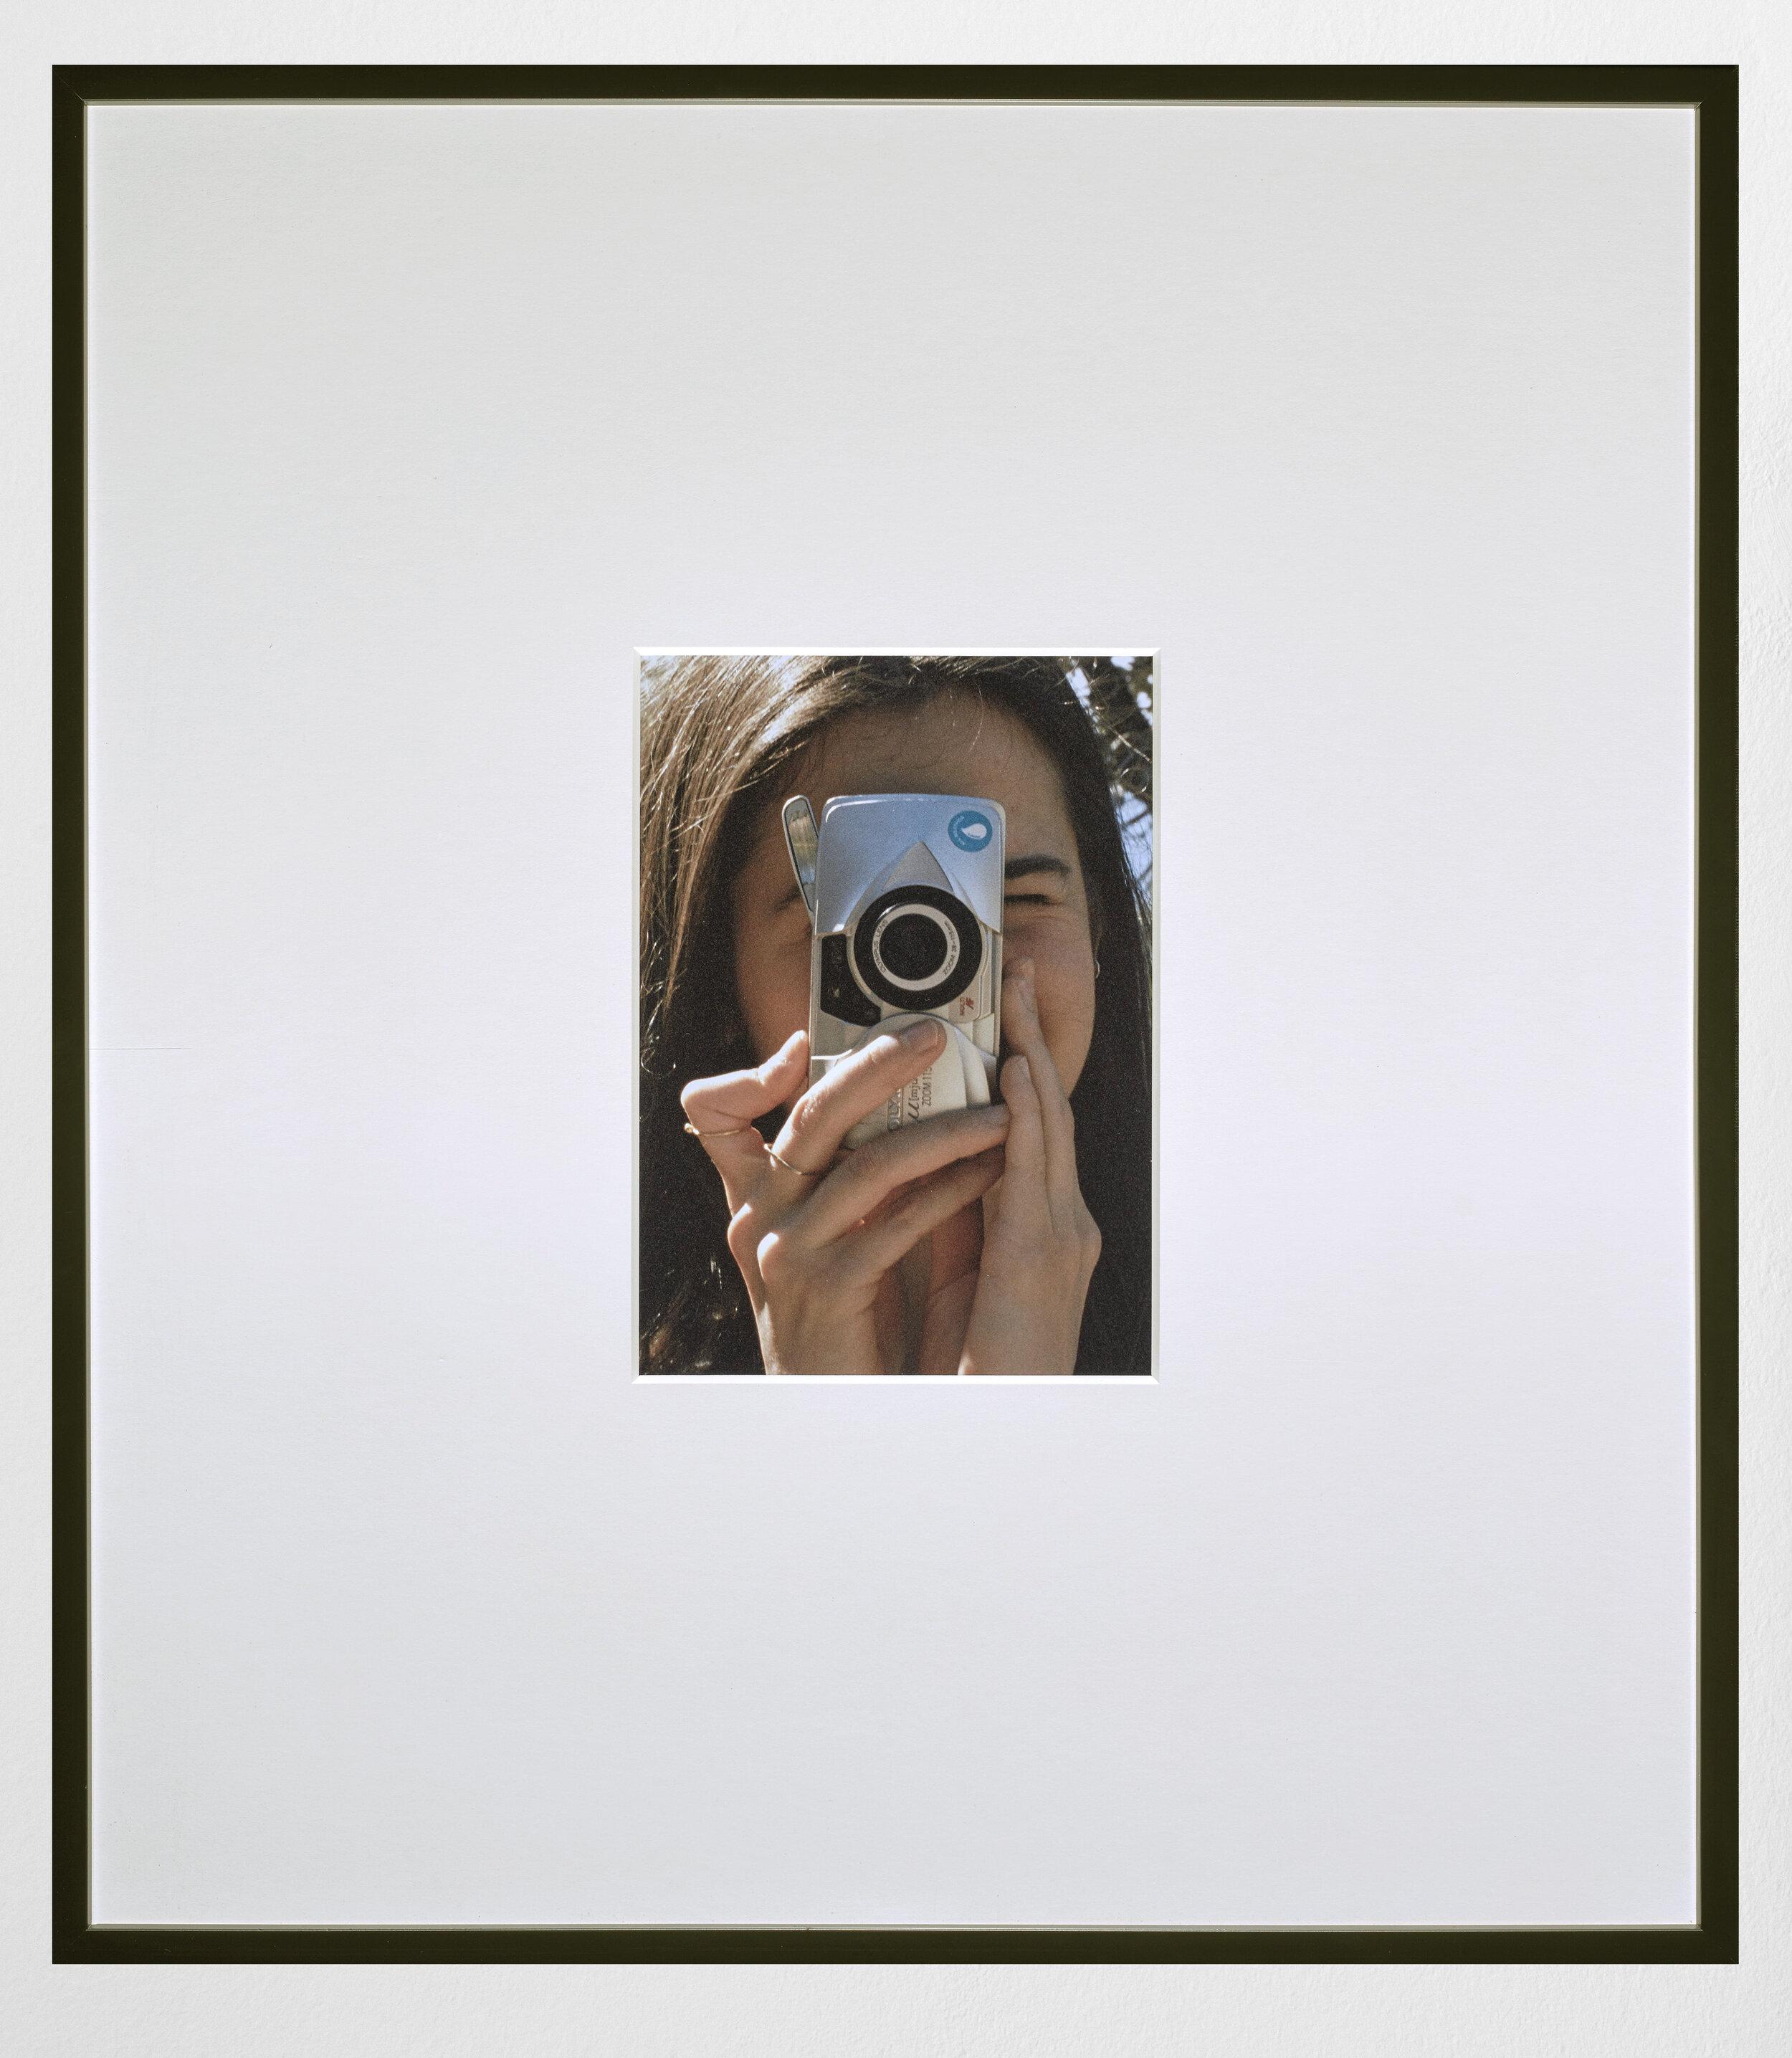 Lua with Camera , 2019, Archival pigment print, 11 x 7.75 inches